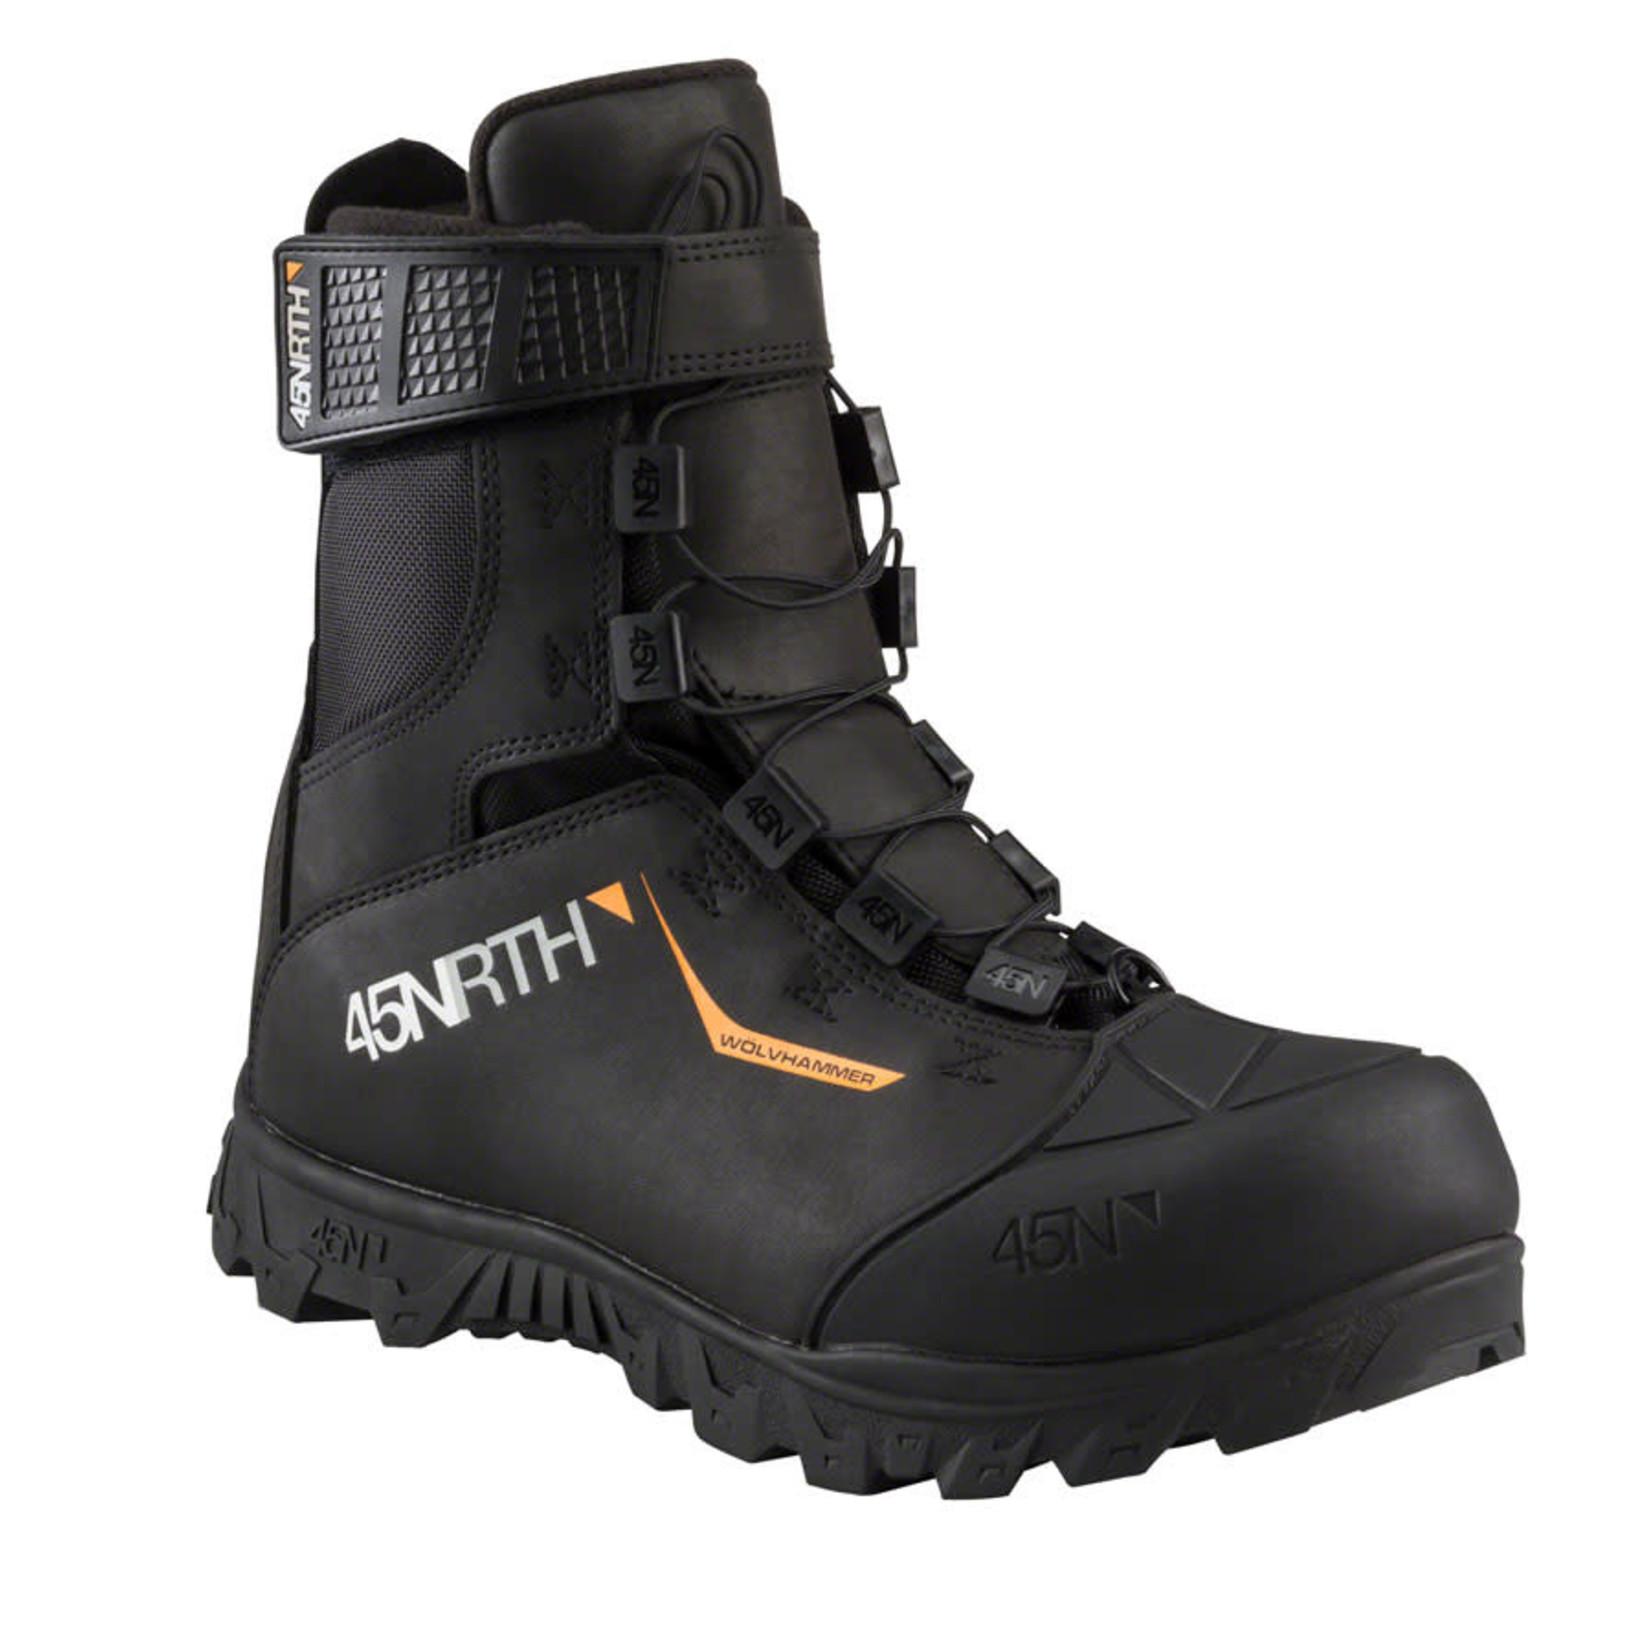 45NRTH 45NRTH Wölvhammer: Black Size 36